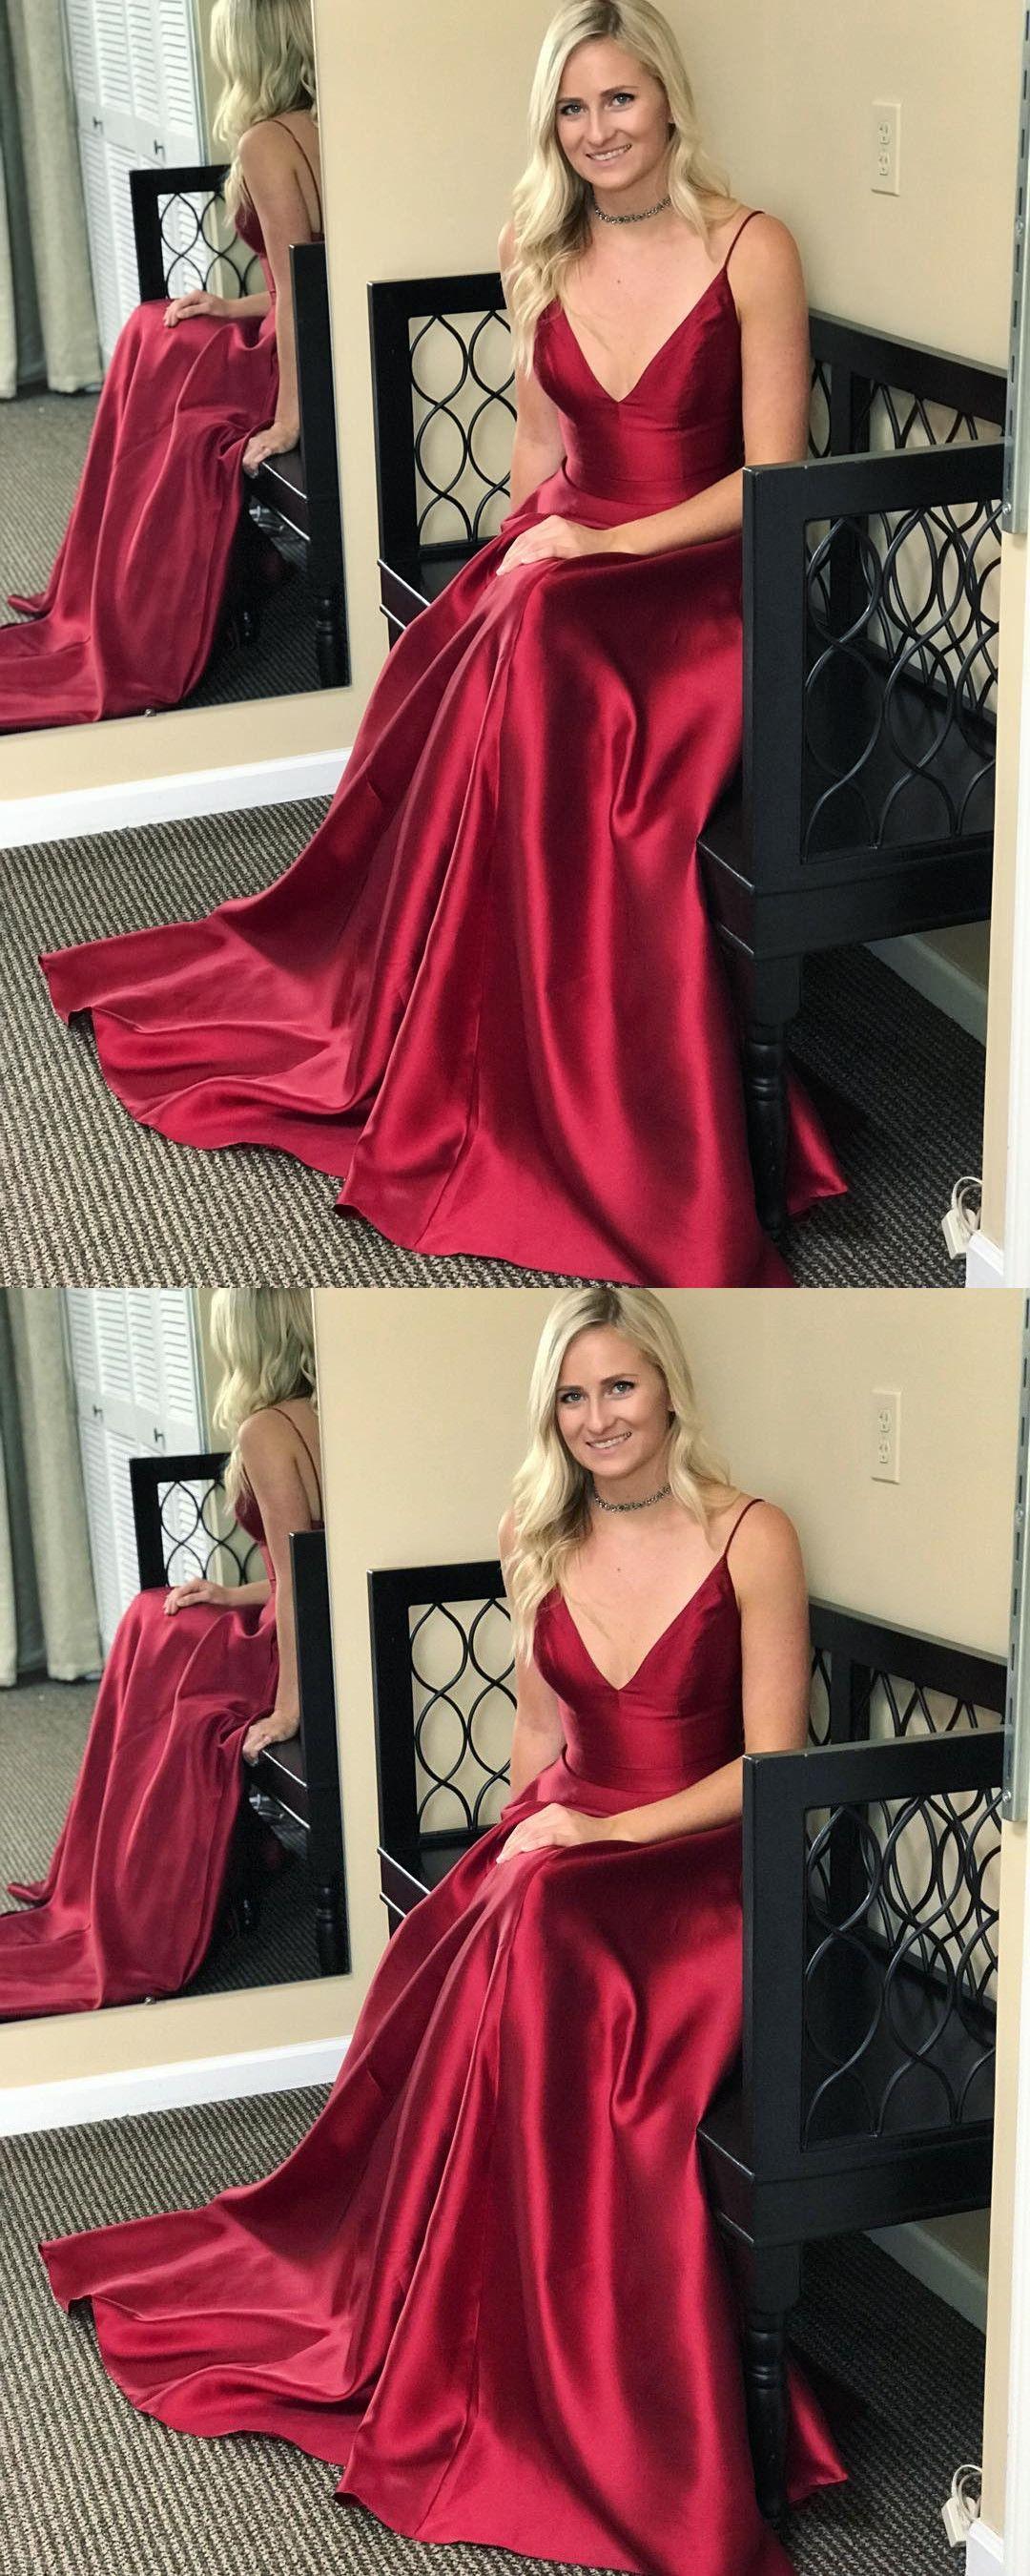 55b1eef08ec Straps V neck Burgundy Long Prom Dress from modsele